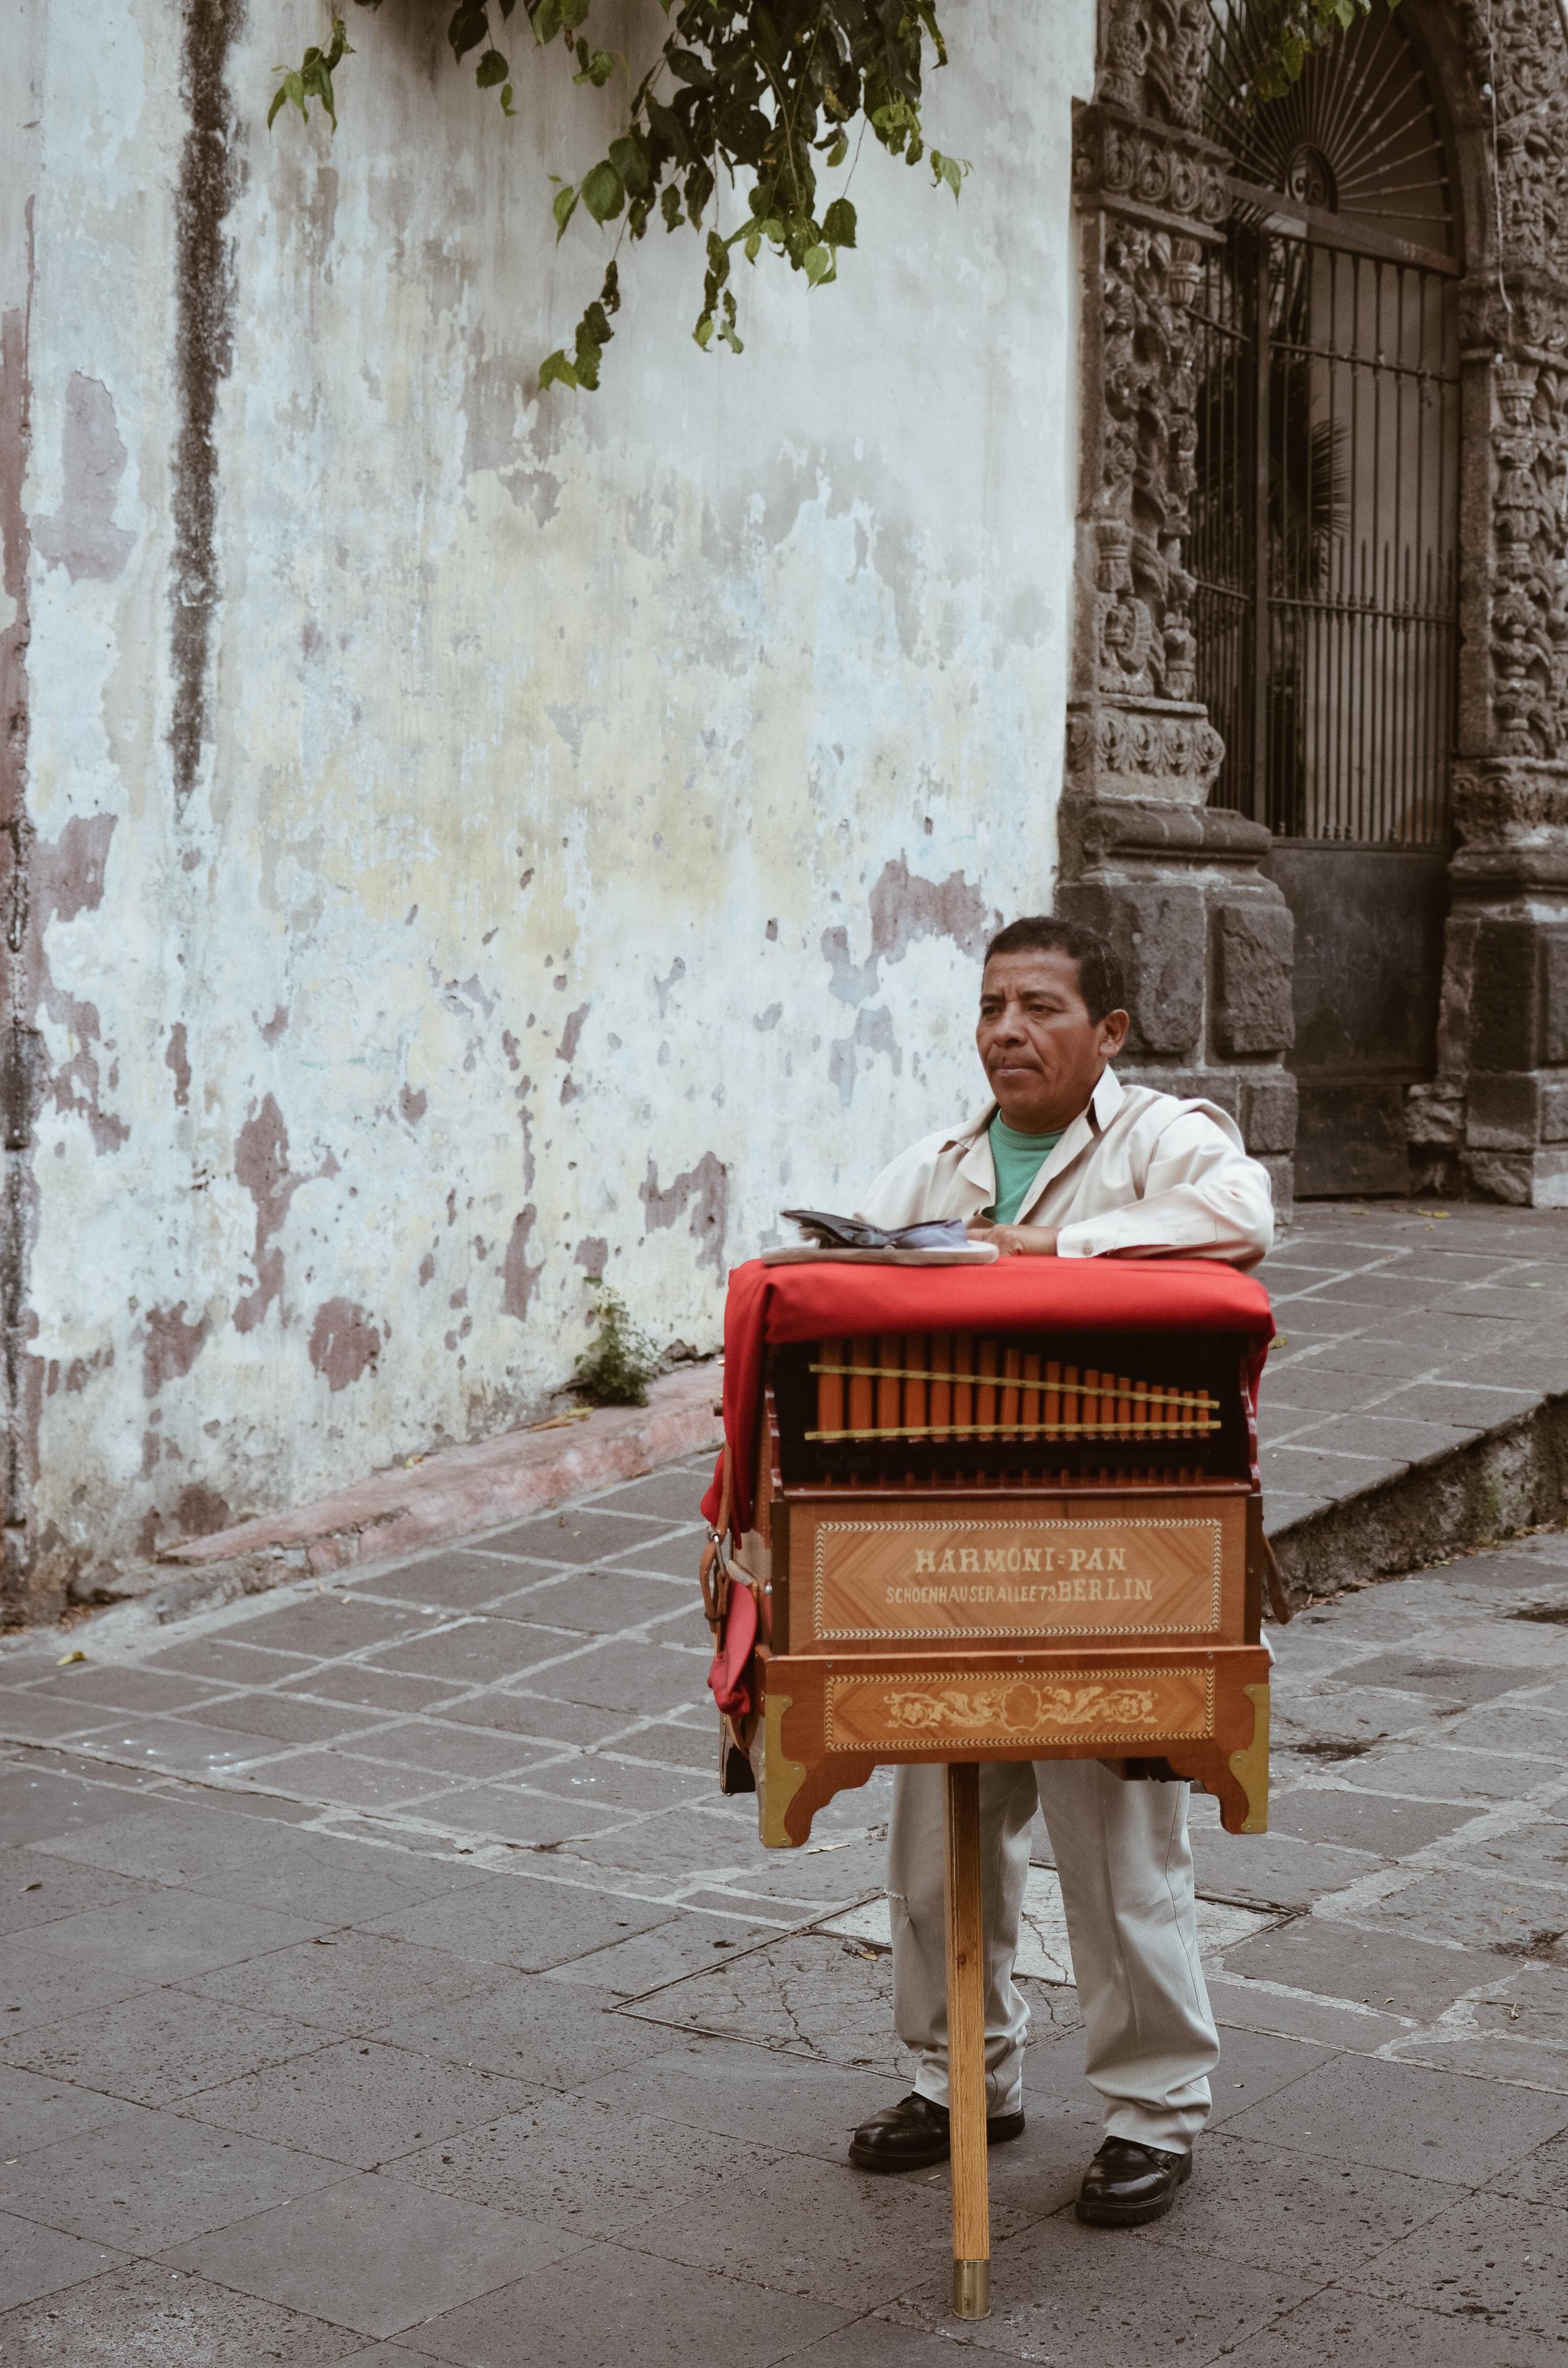 mexico+city+kate+parrish+life+on+pine_DSC_0255.jpg